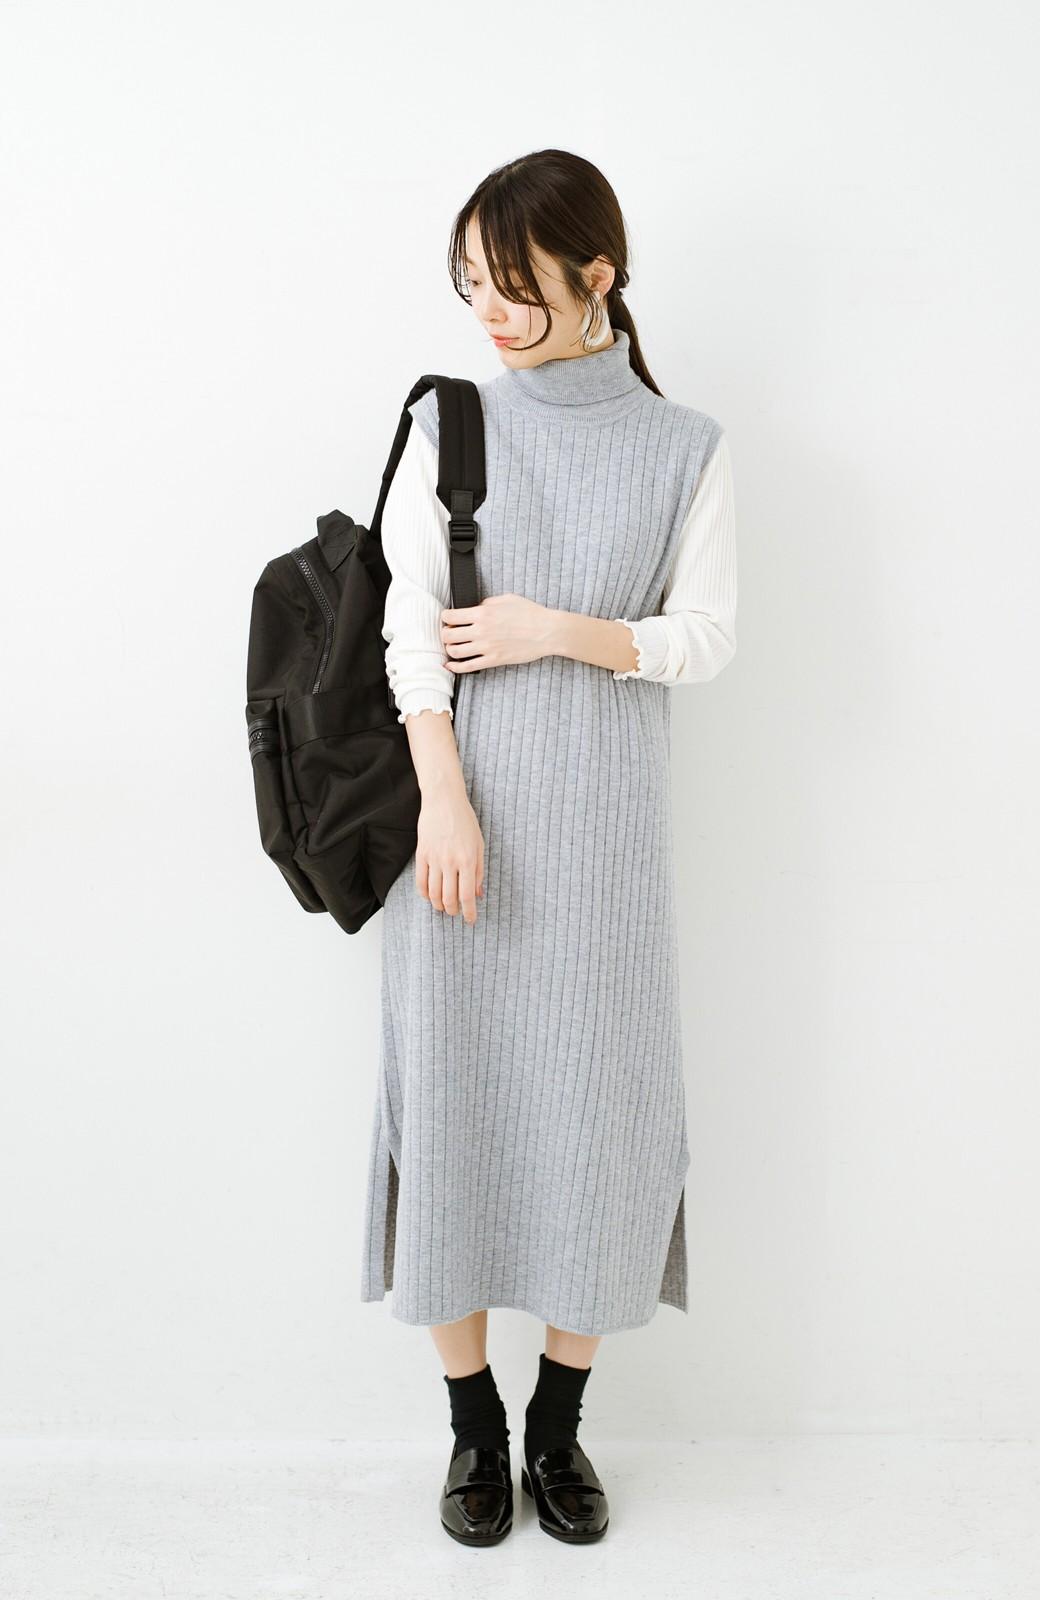 haco! セットで着るだけパッとかわいい ニットトップス&ノースリーブニットワンピースセット <グレー>の商品写真4